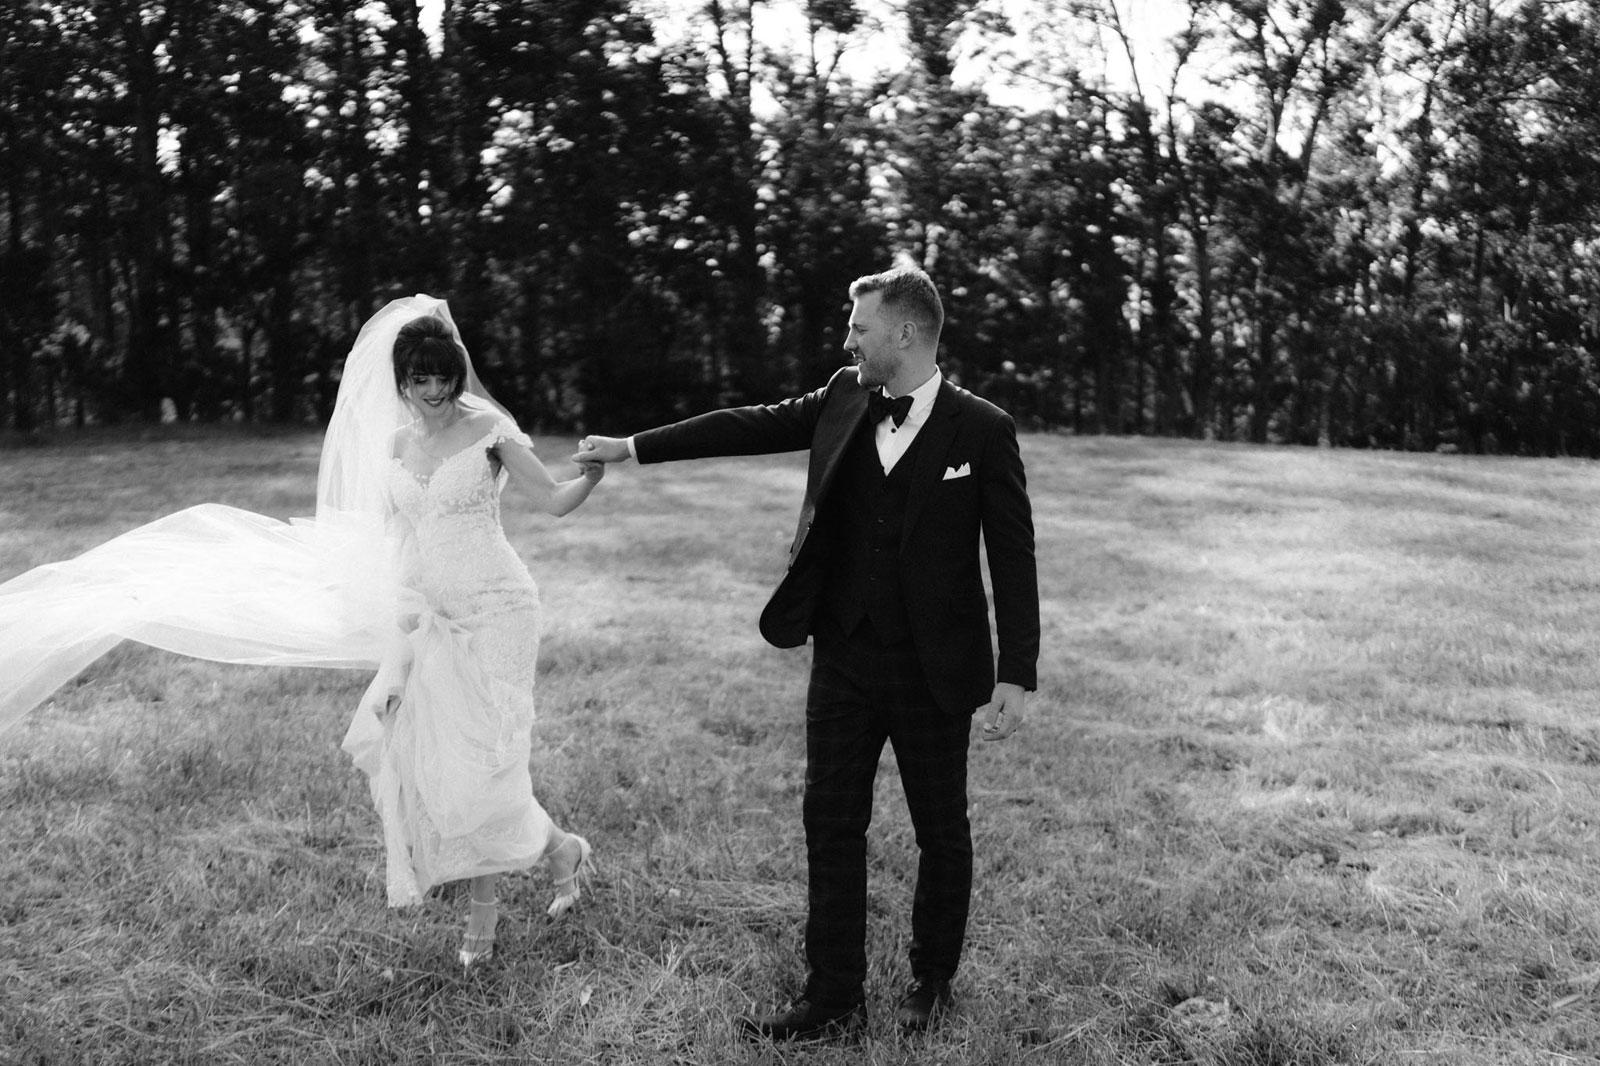 newfound-n-c-olive-tree-cottage-tauranga-wedding-photographer-852